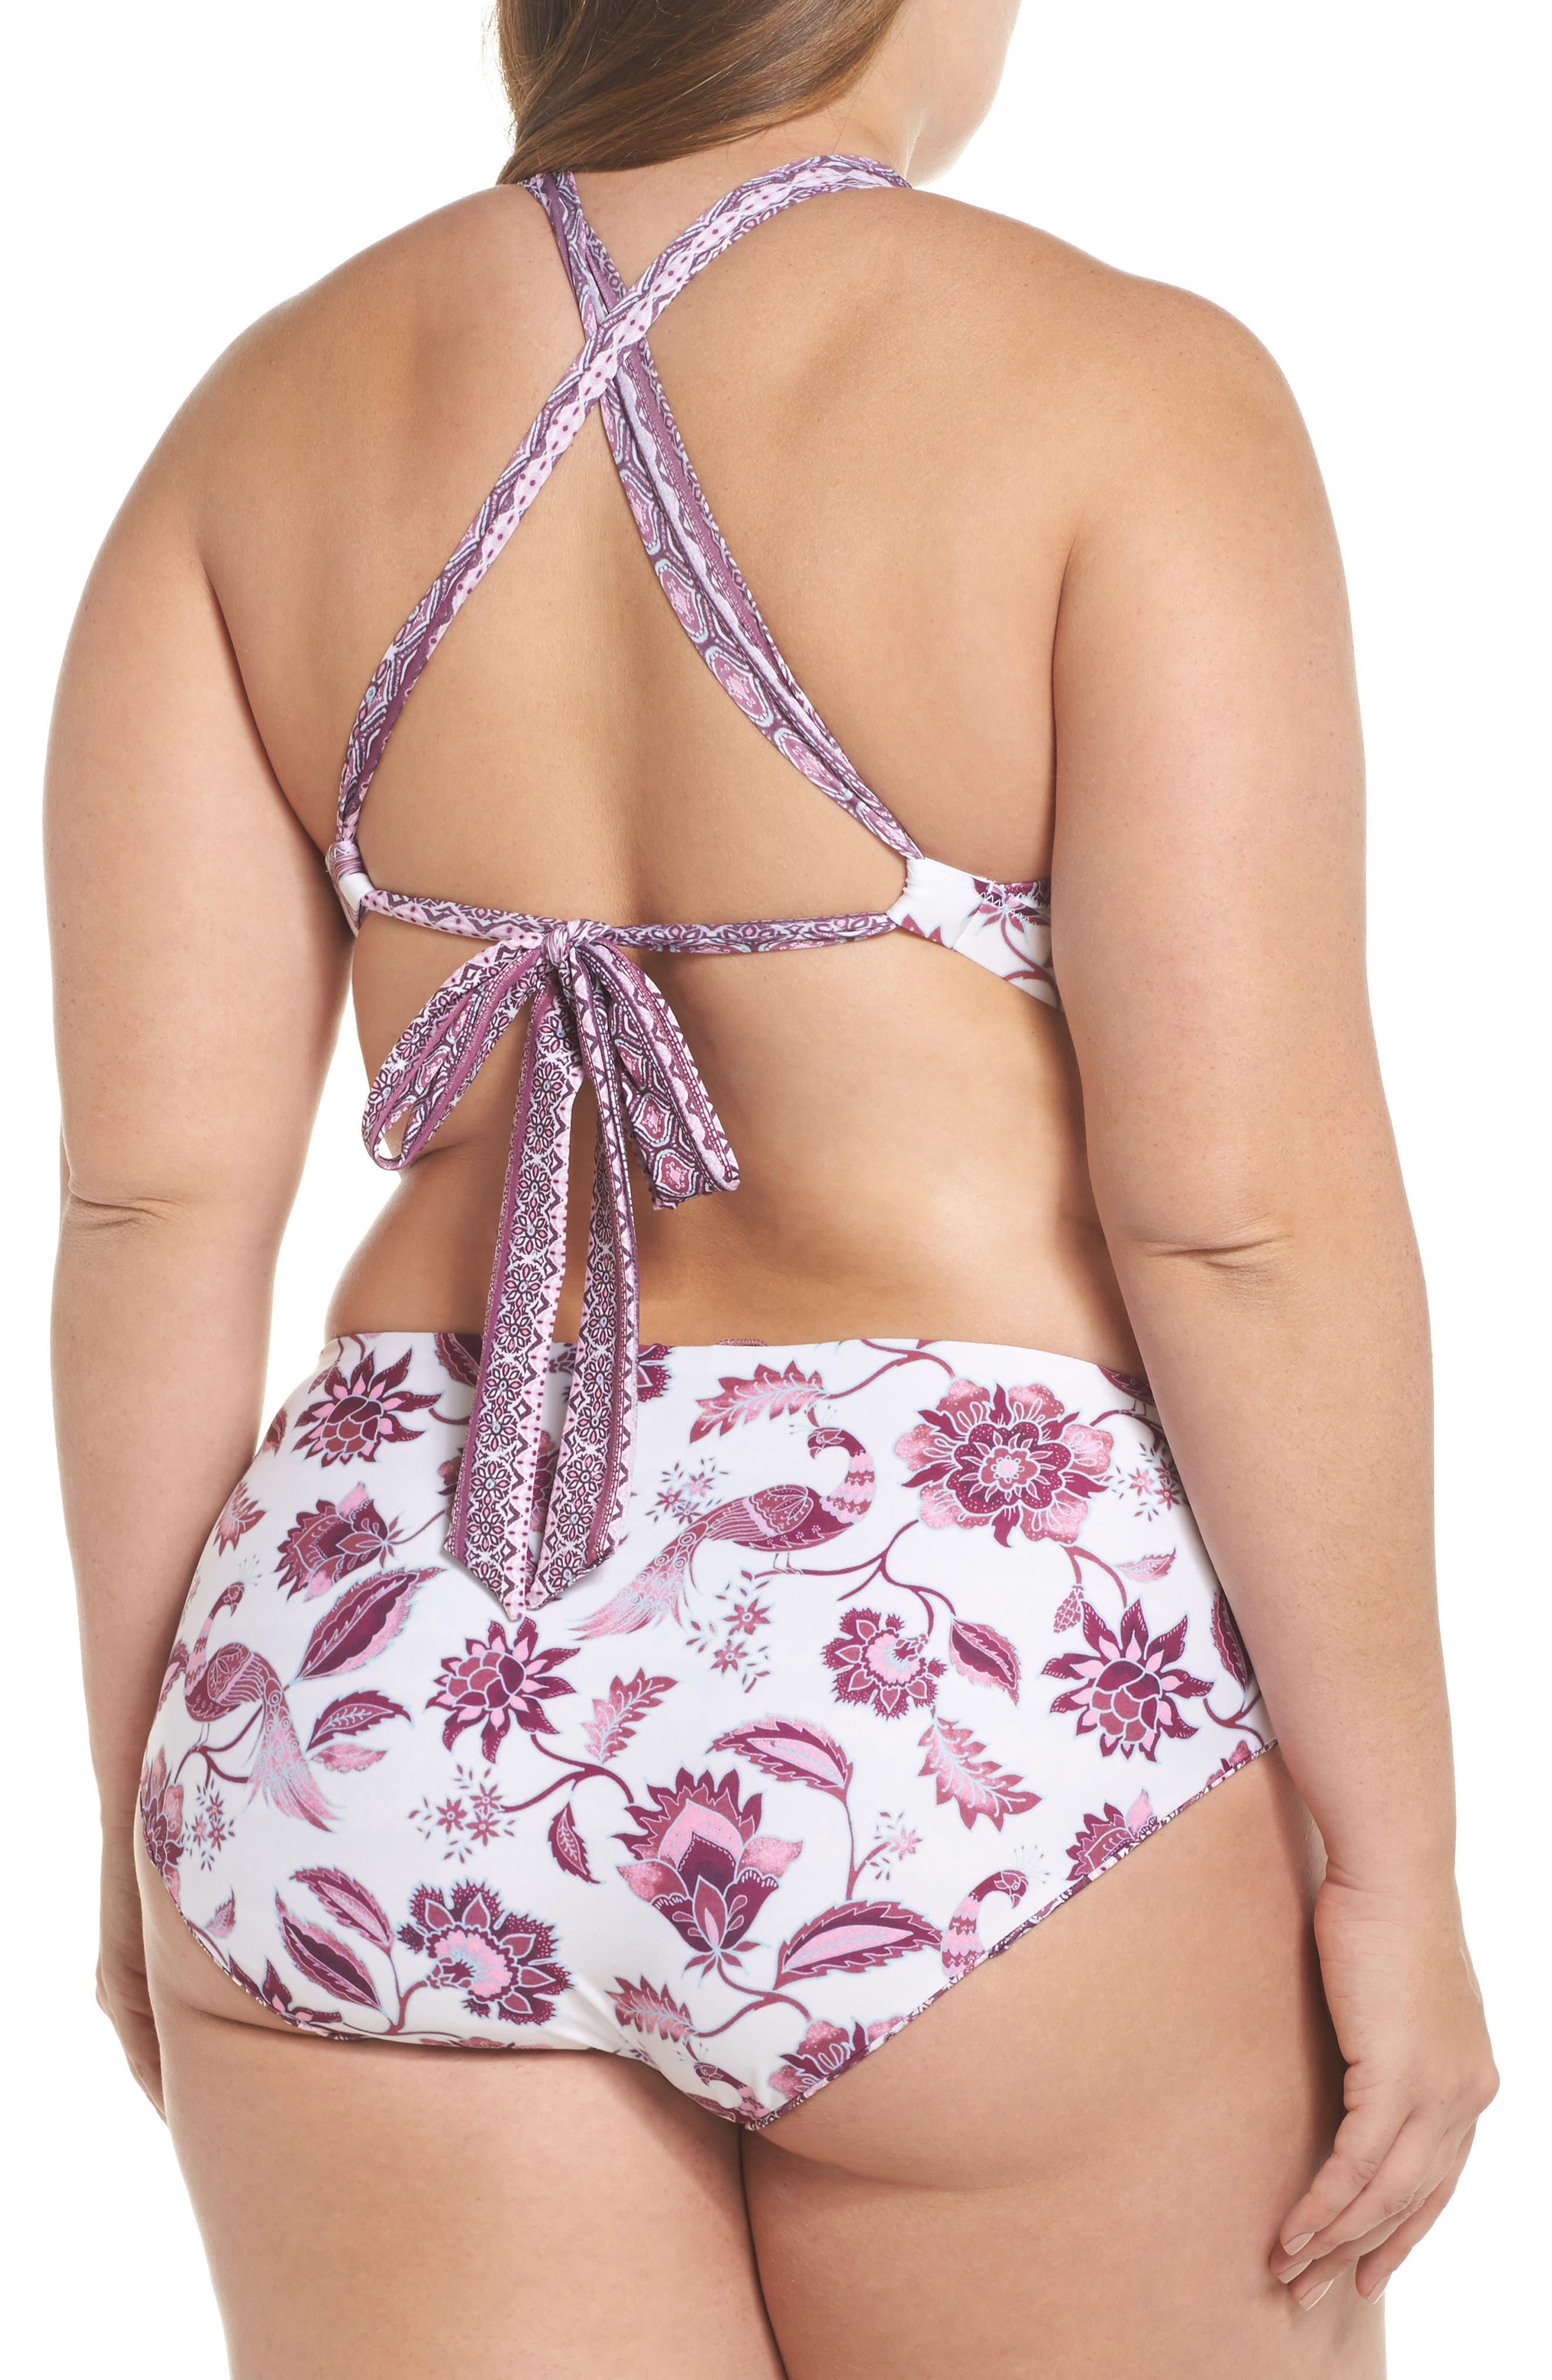 Tahiti Halter Bikini Top,                             Alternate thumbnail 6, color,                             Purple Multi